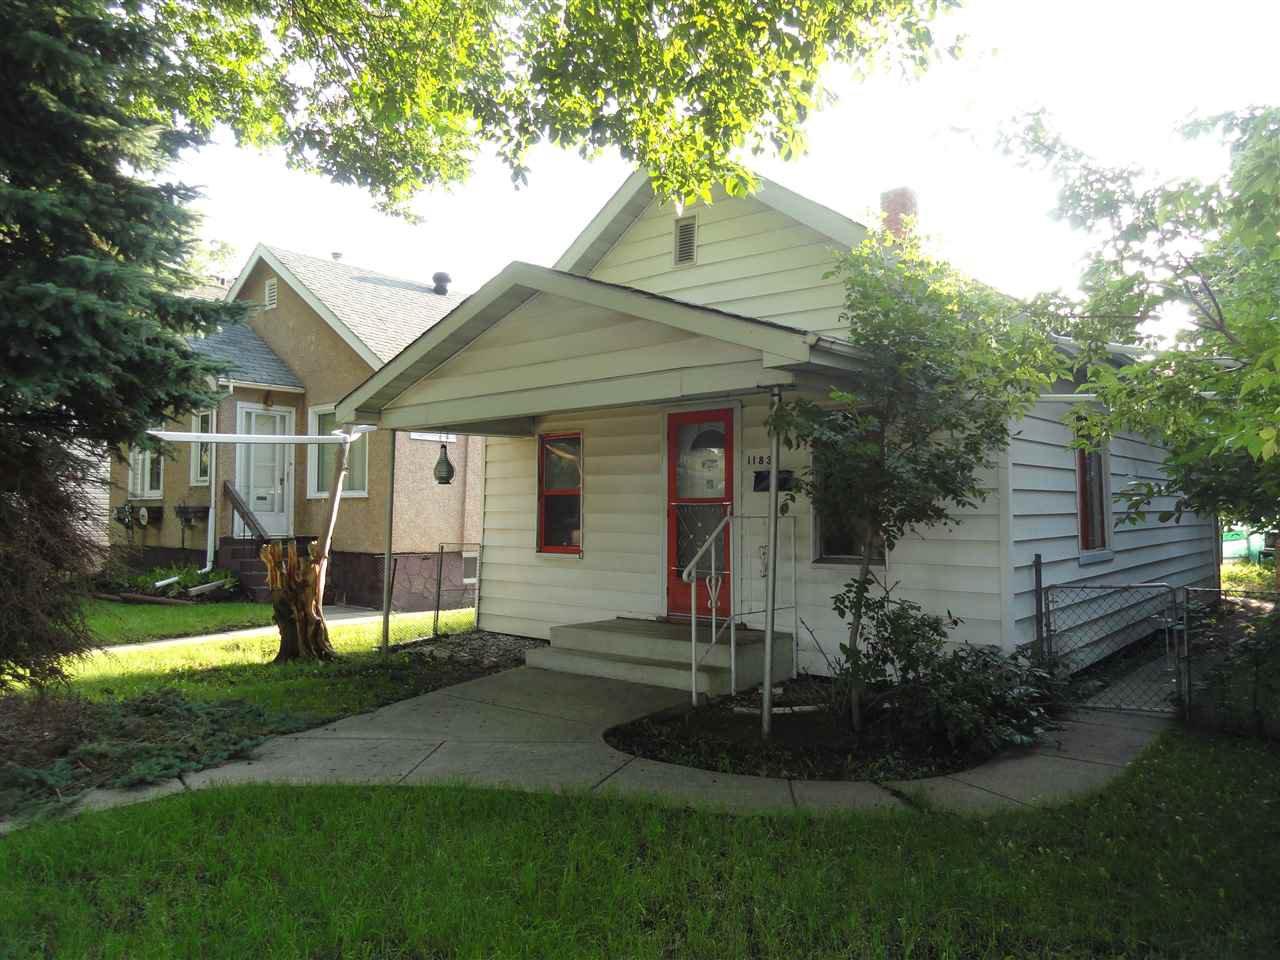 Main Photo: 11839 95 Street in Edmonton: Zone 05 House for sale : MLS®# E4181568